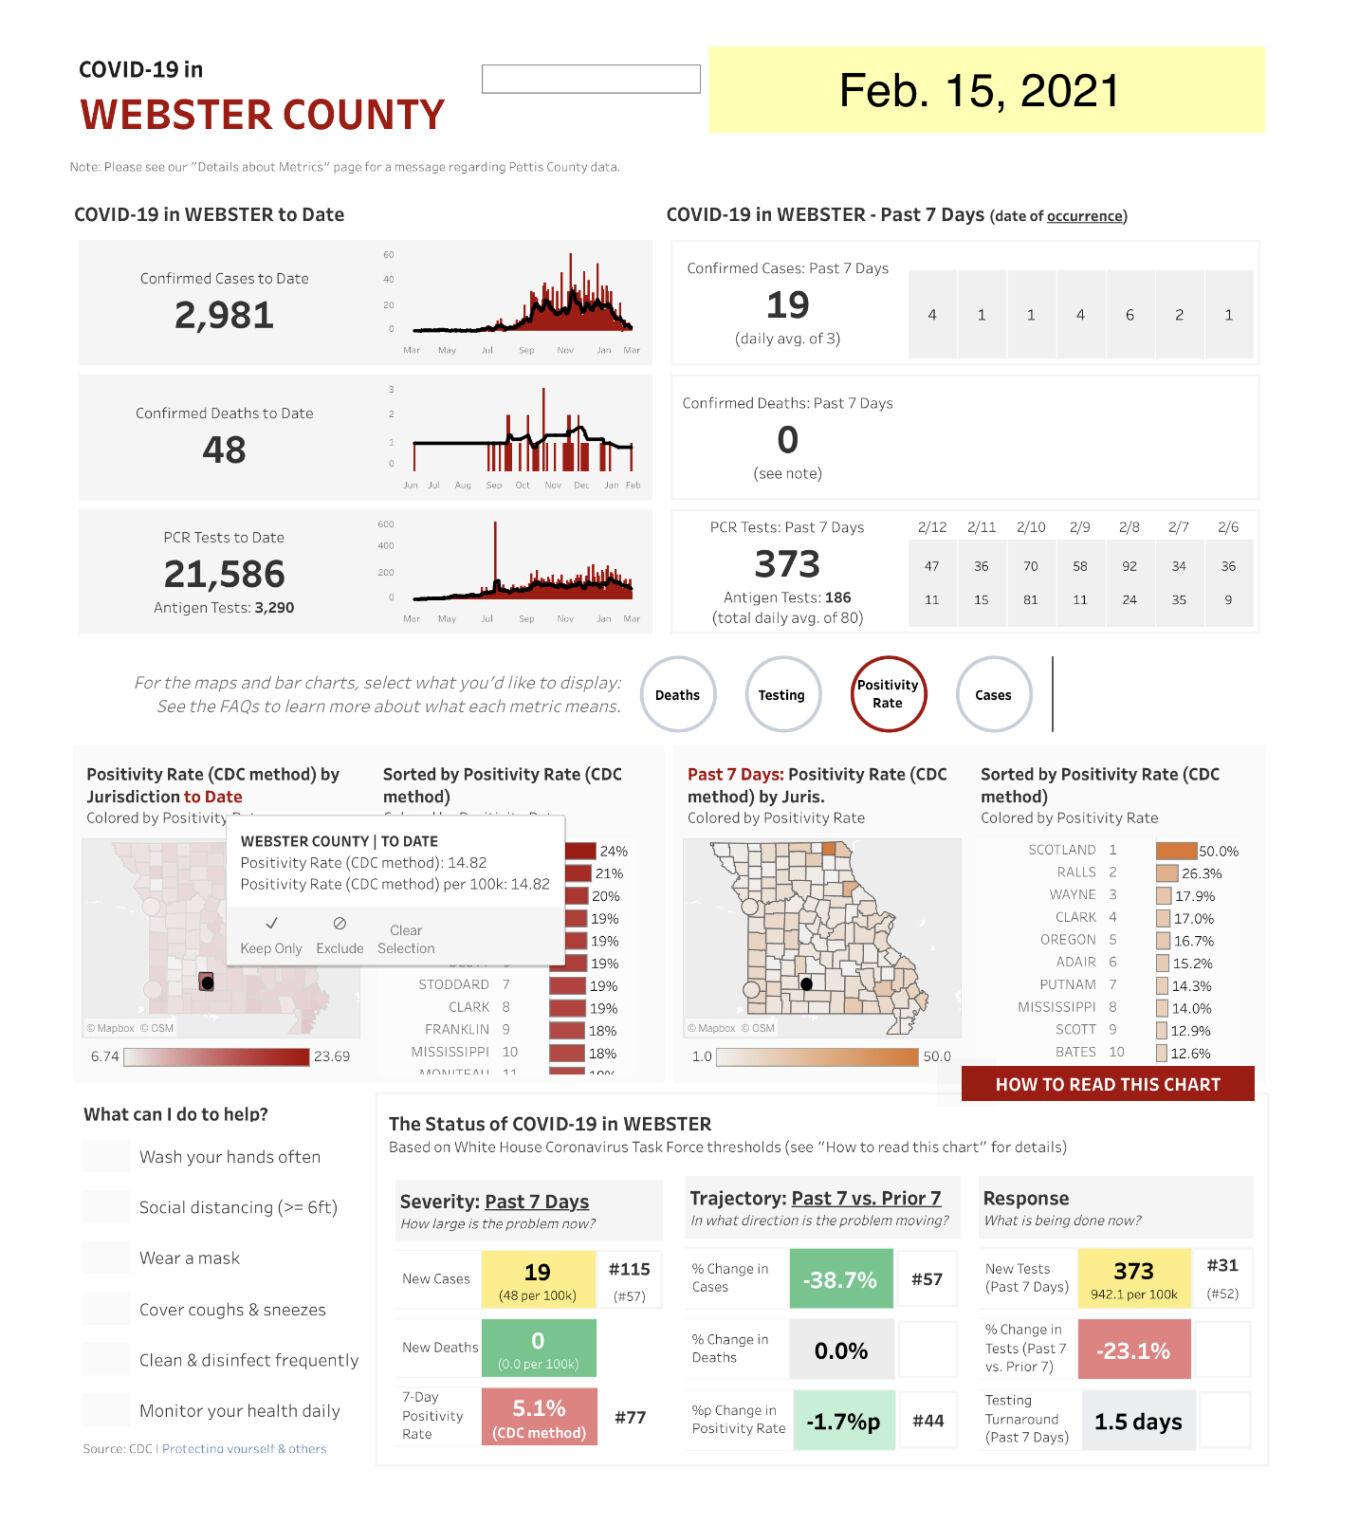 - COVID-19 cases Feb. 15 Web. Co. Mo. State